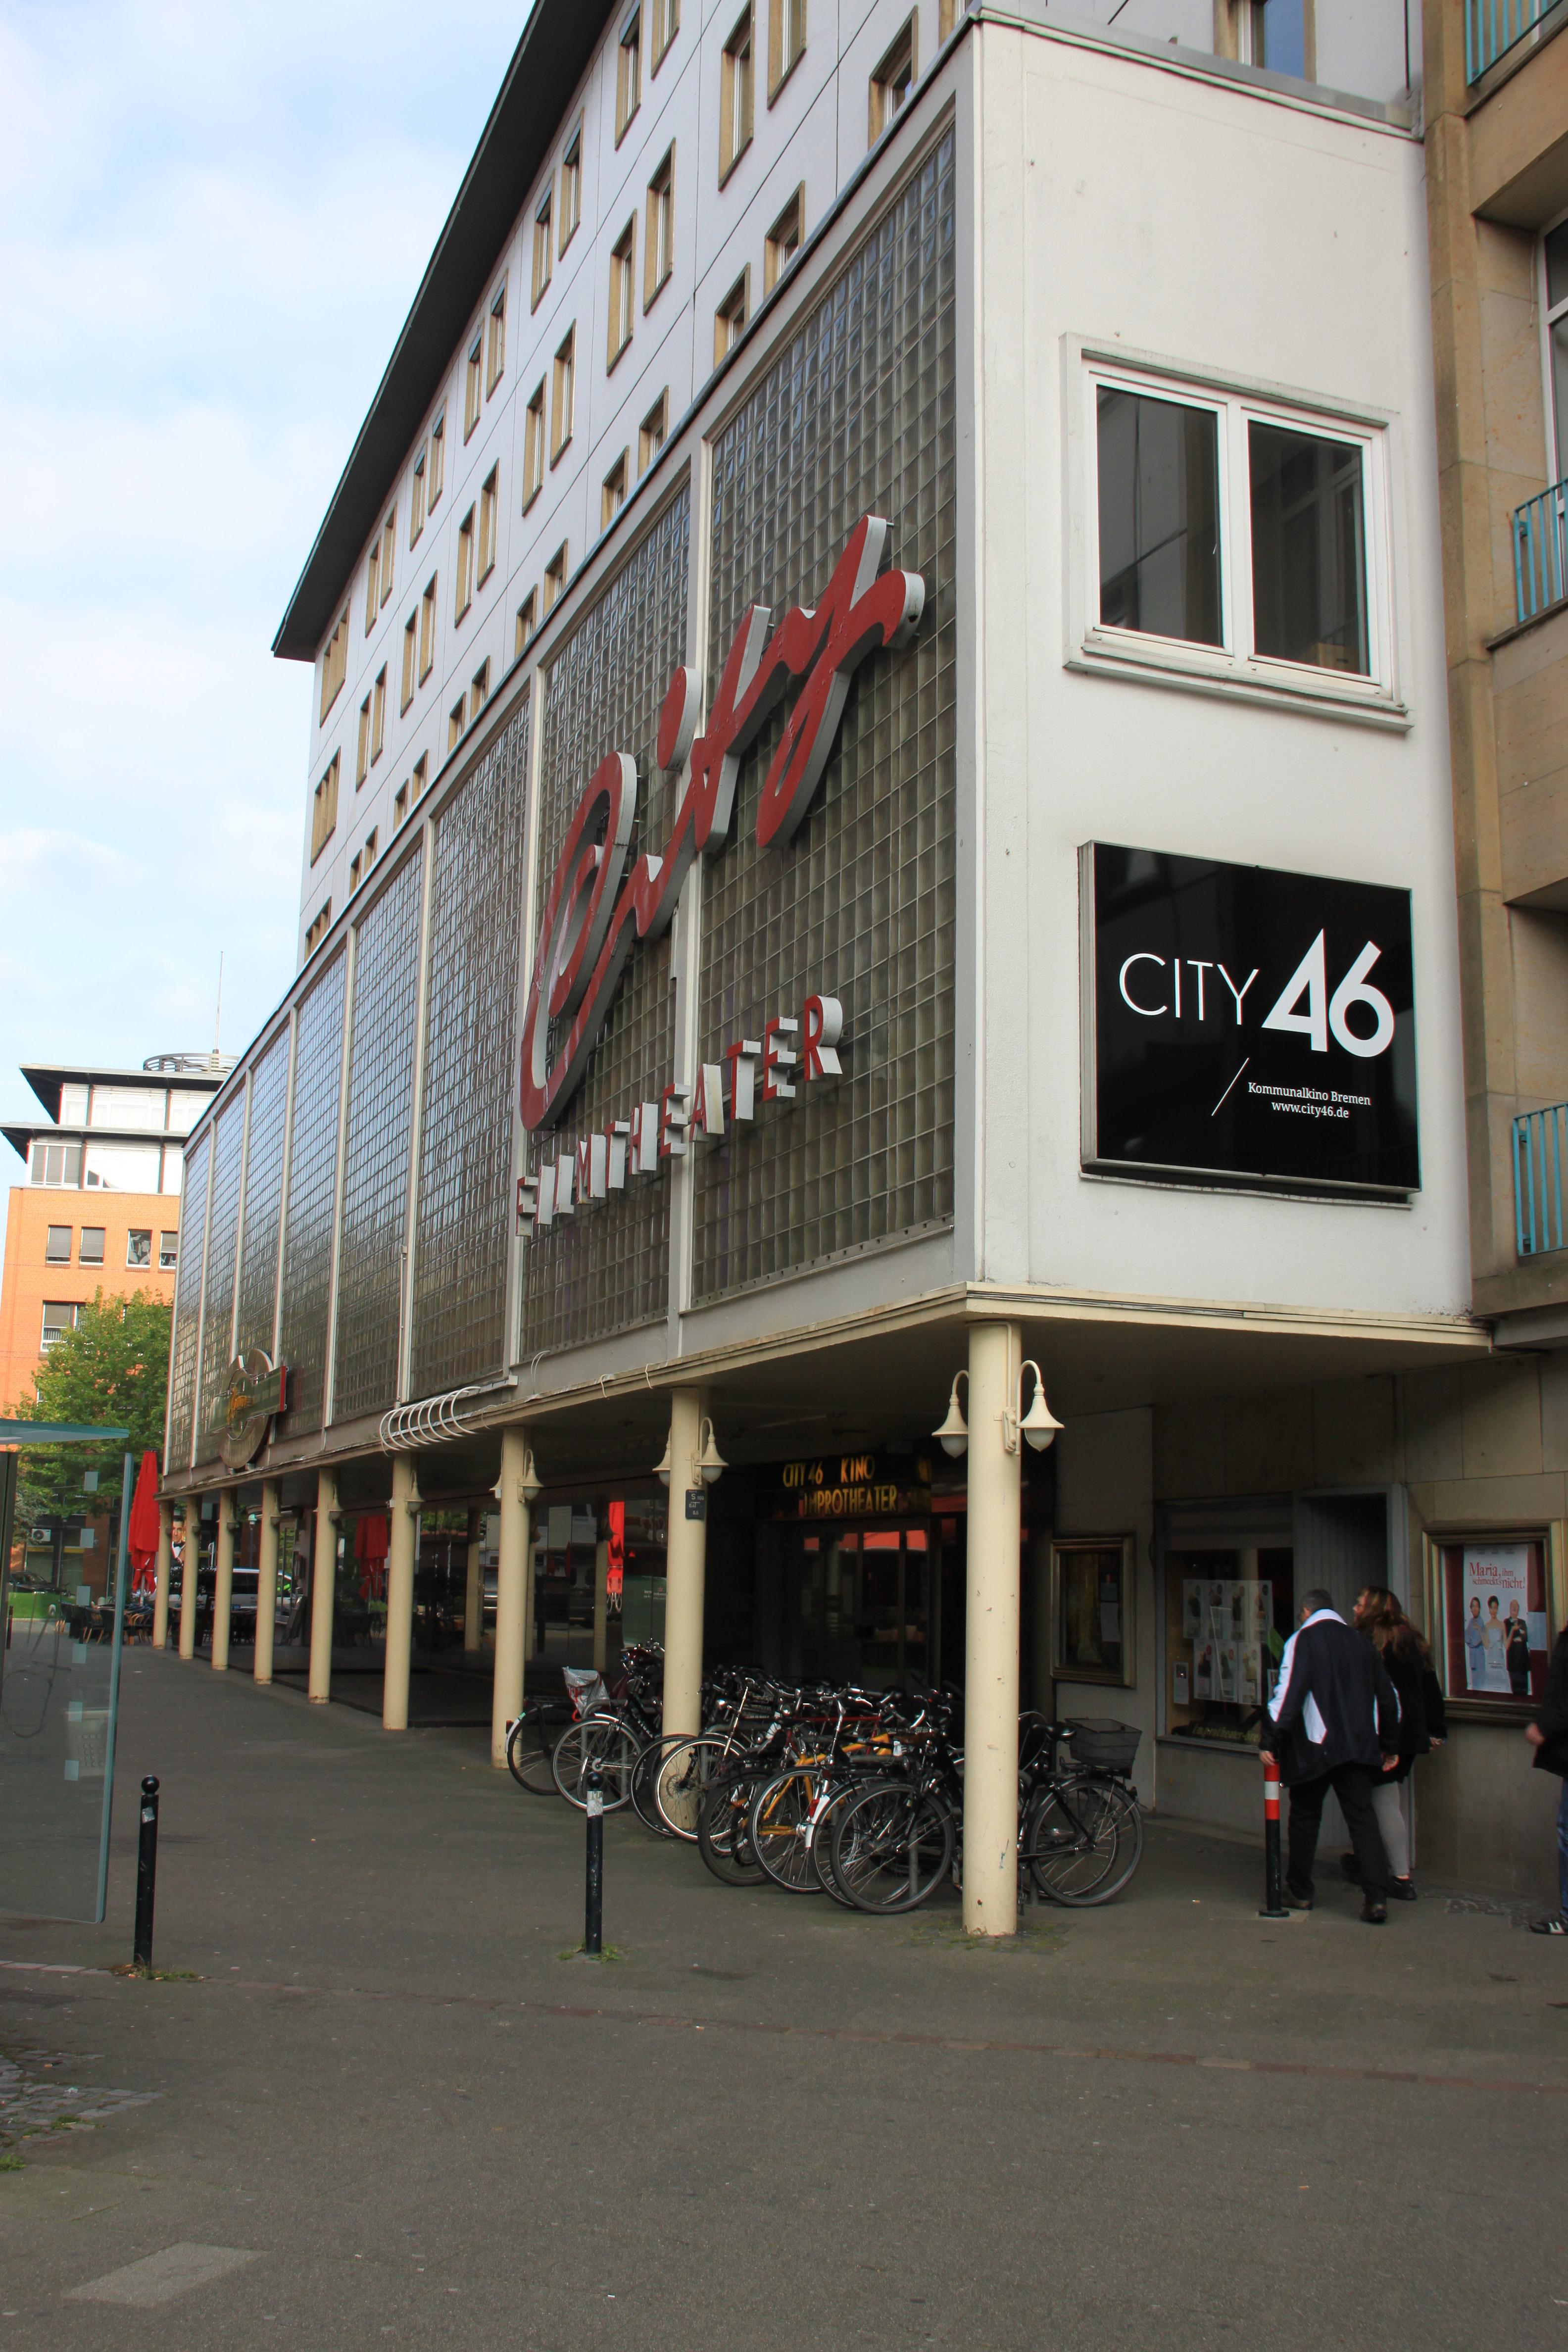 City 46 Bremen